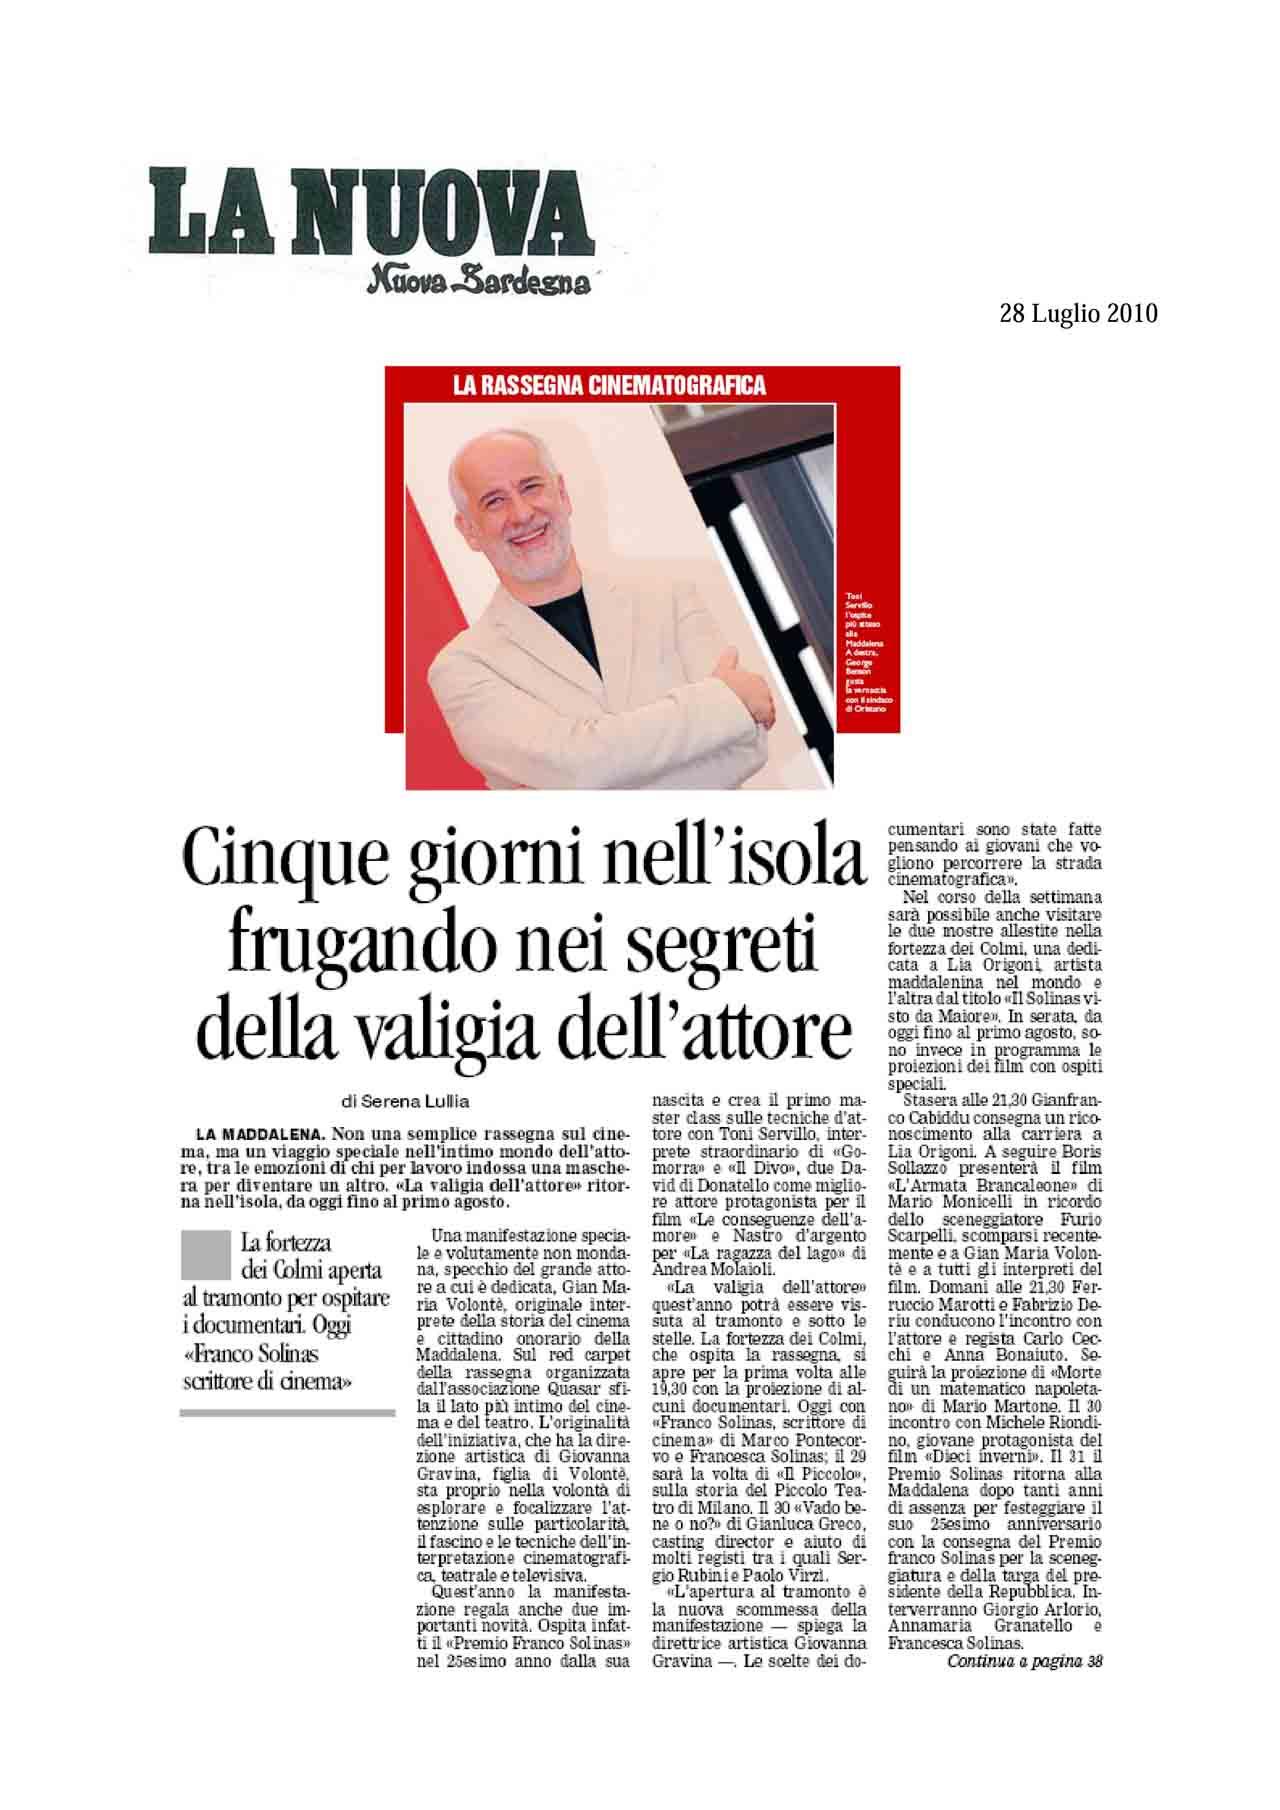 28 - 07 - 10 La Nuova Sardegna pag. 1